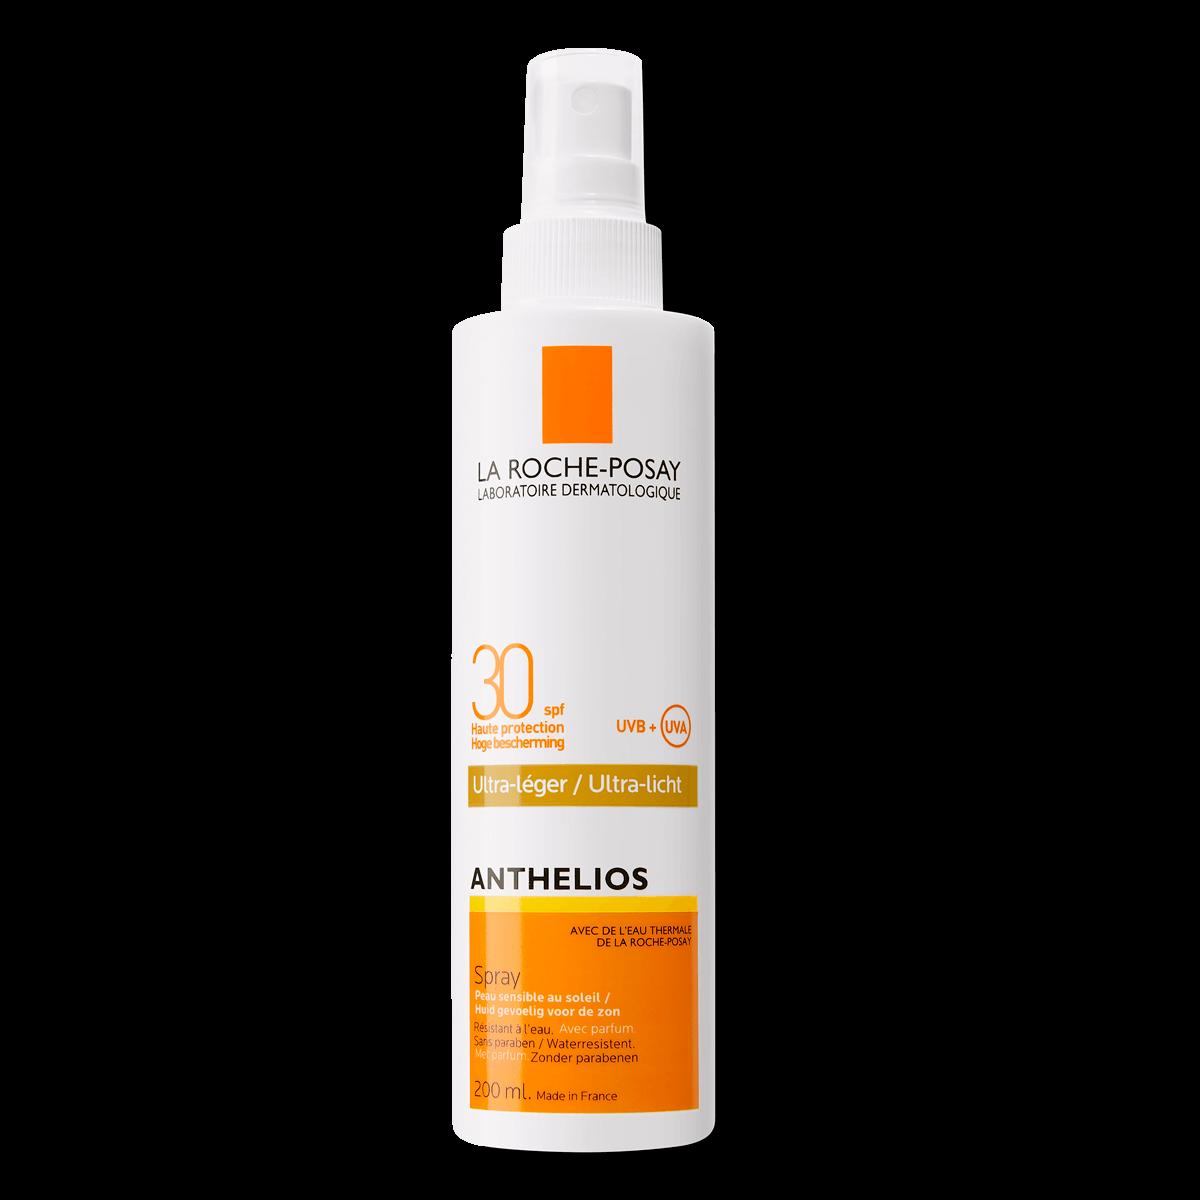 La Roche Posay ProductPage Sun Anthelios Ultra Light Spray Spf30 200ml